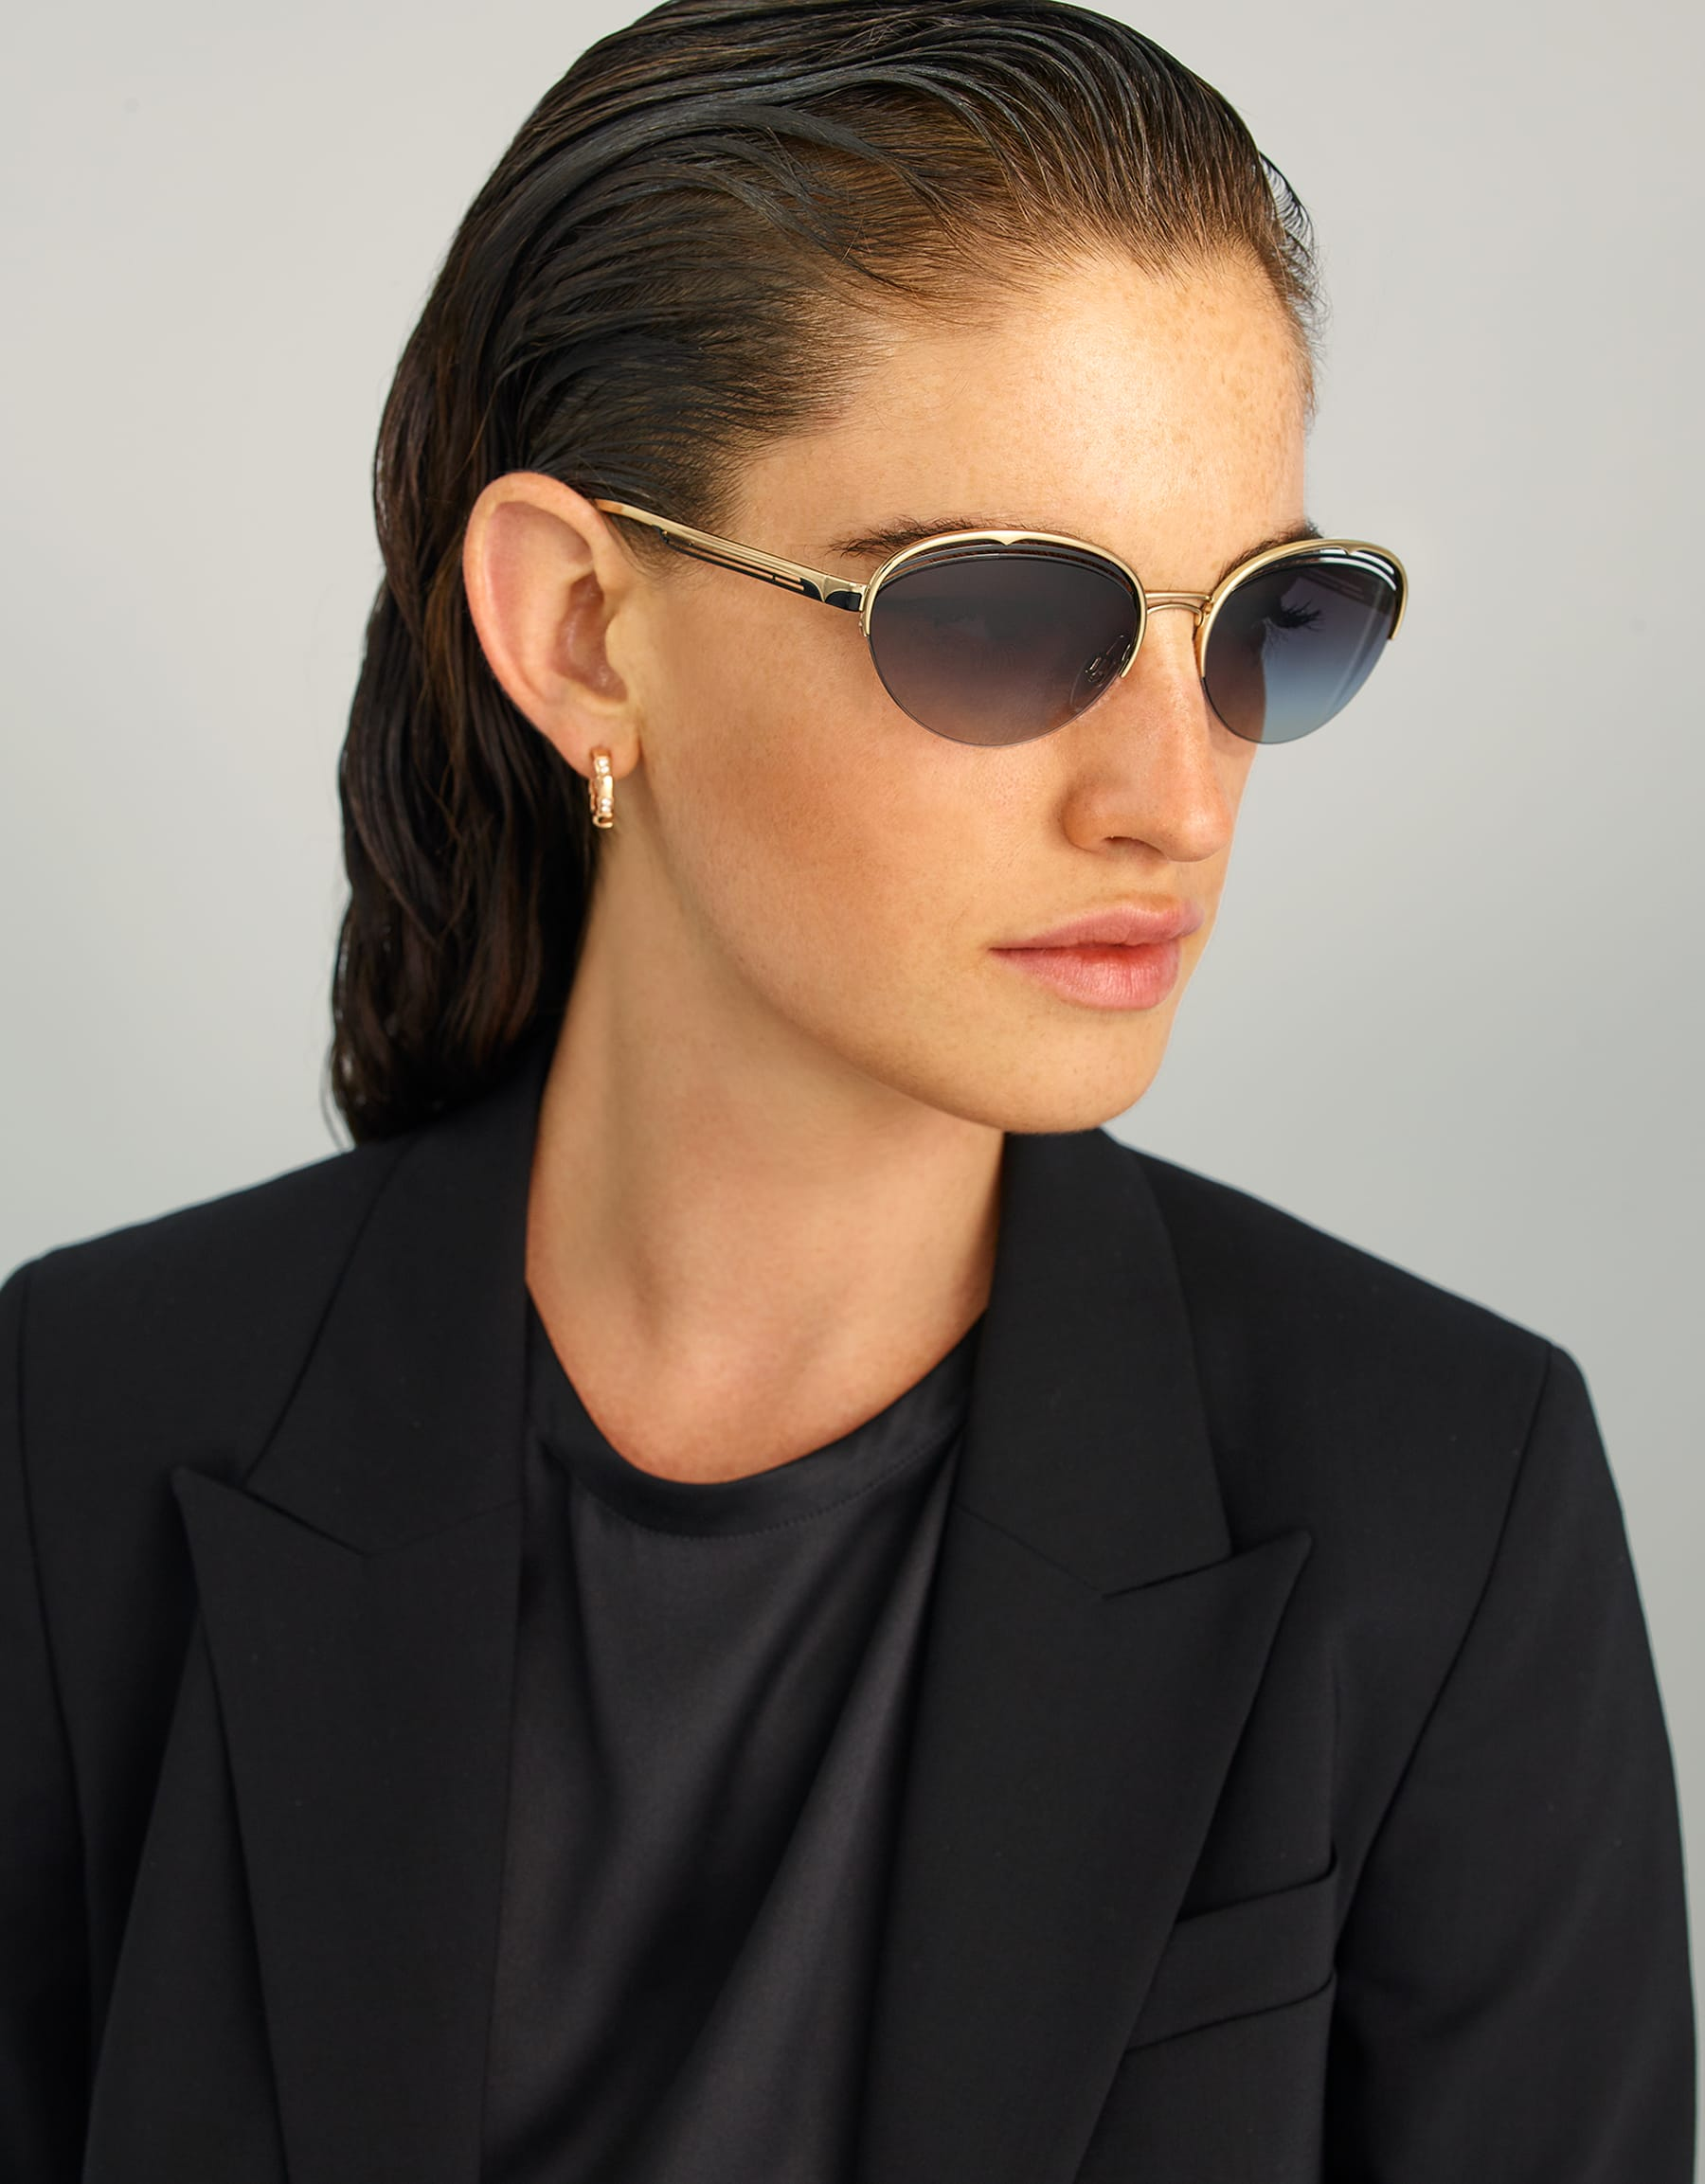 Gafas de sol Bvlgari B.zero1 B.retrovibe ovaladas con semiarmazón en metal. 903893 image 3